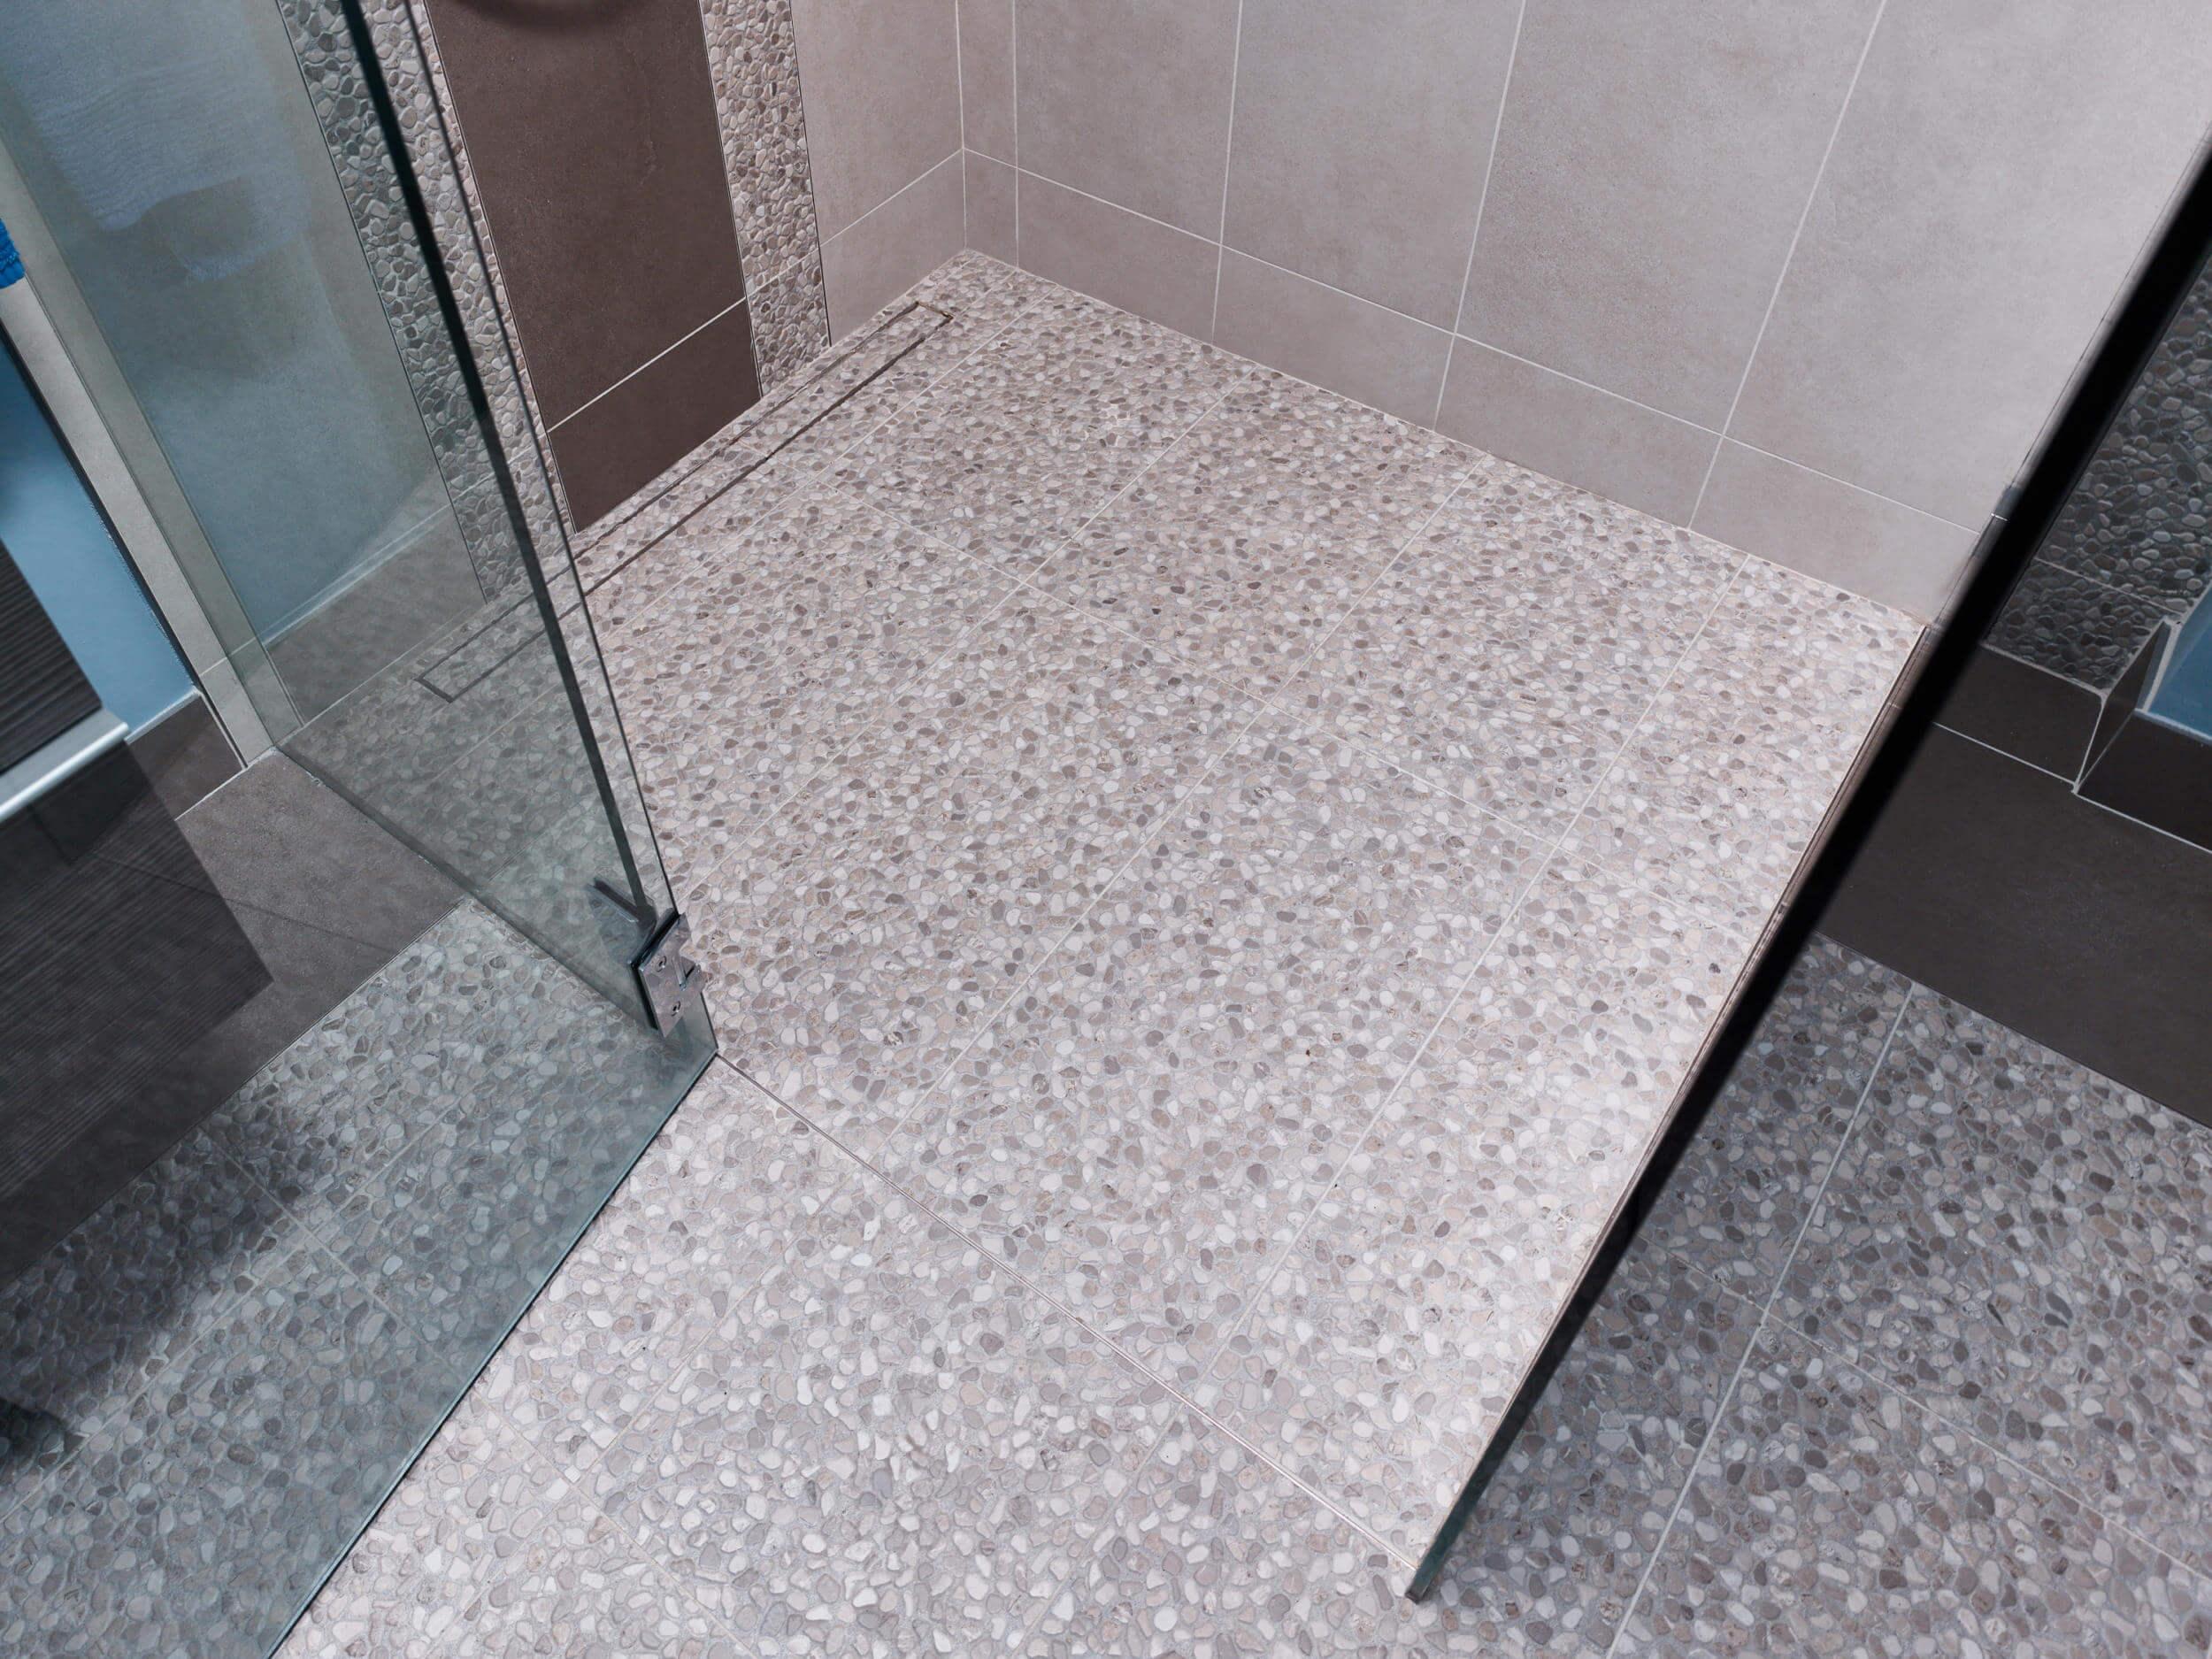 american standard kitchen faucet door knobs blau badezimmer - bathroom renovation revision custom ...